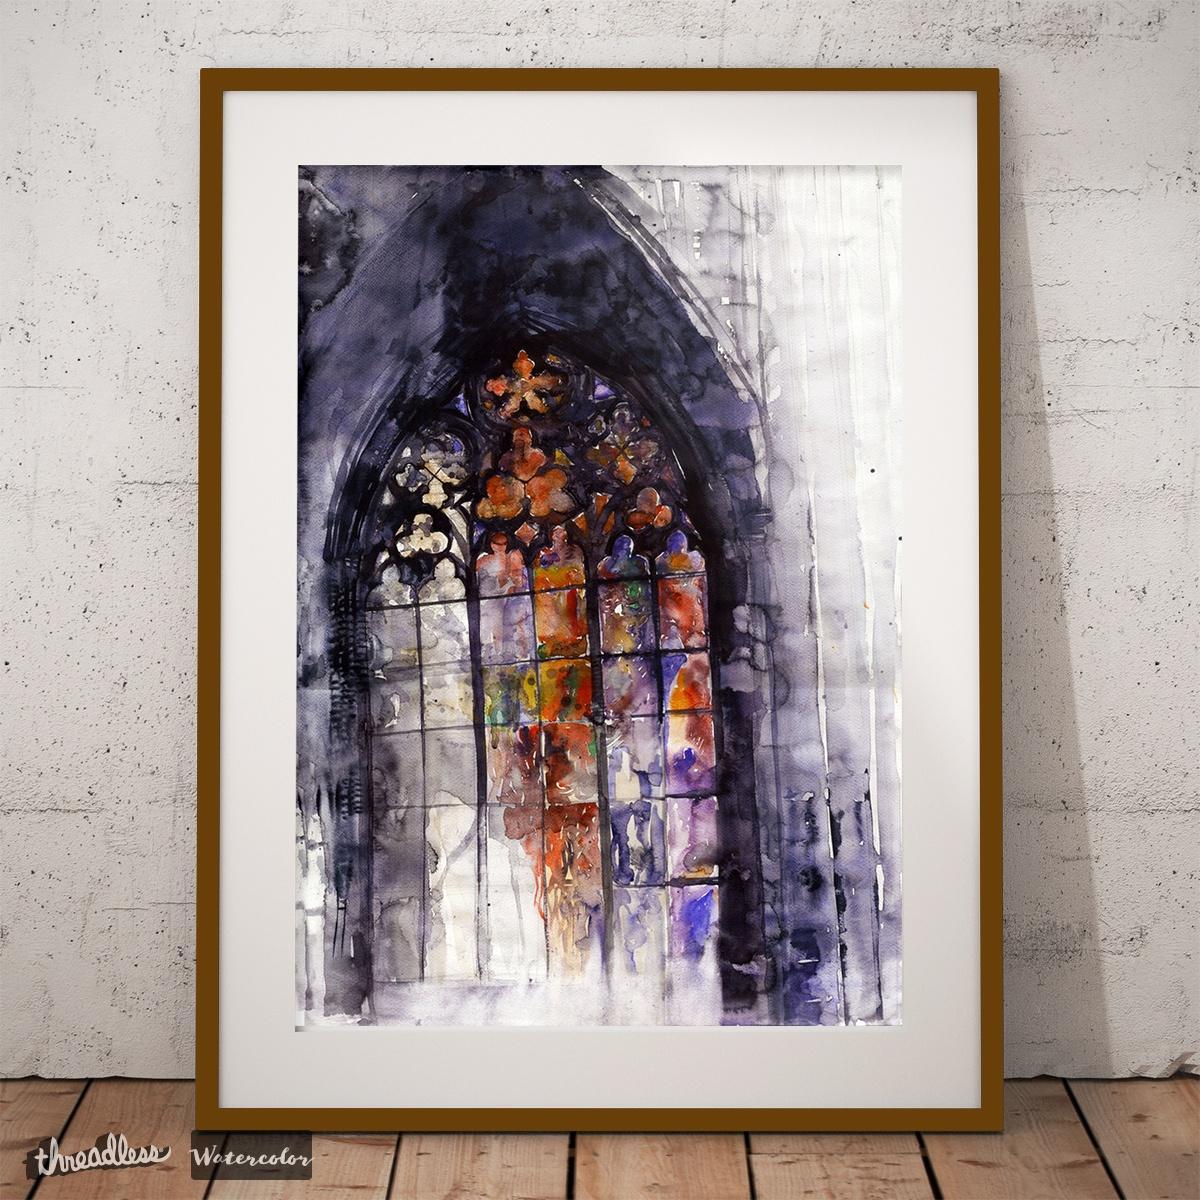 1200x1200 Score Watercolor Stained Glass Window By Majawronska On Threadless